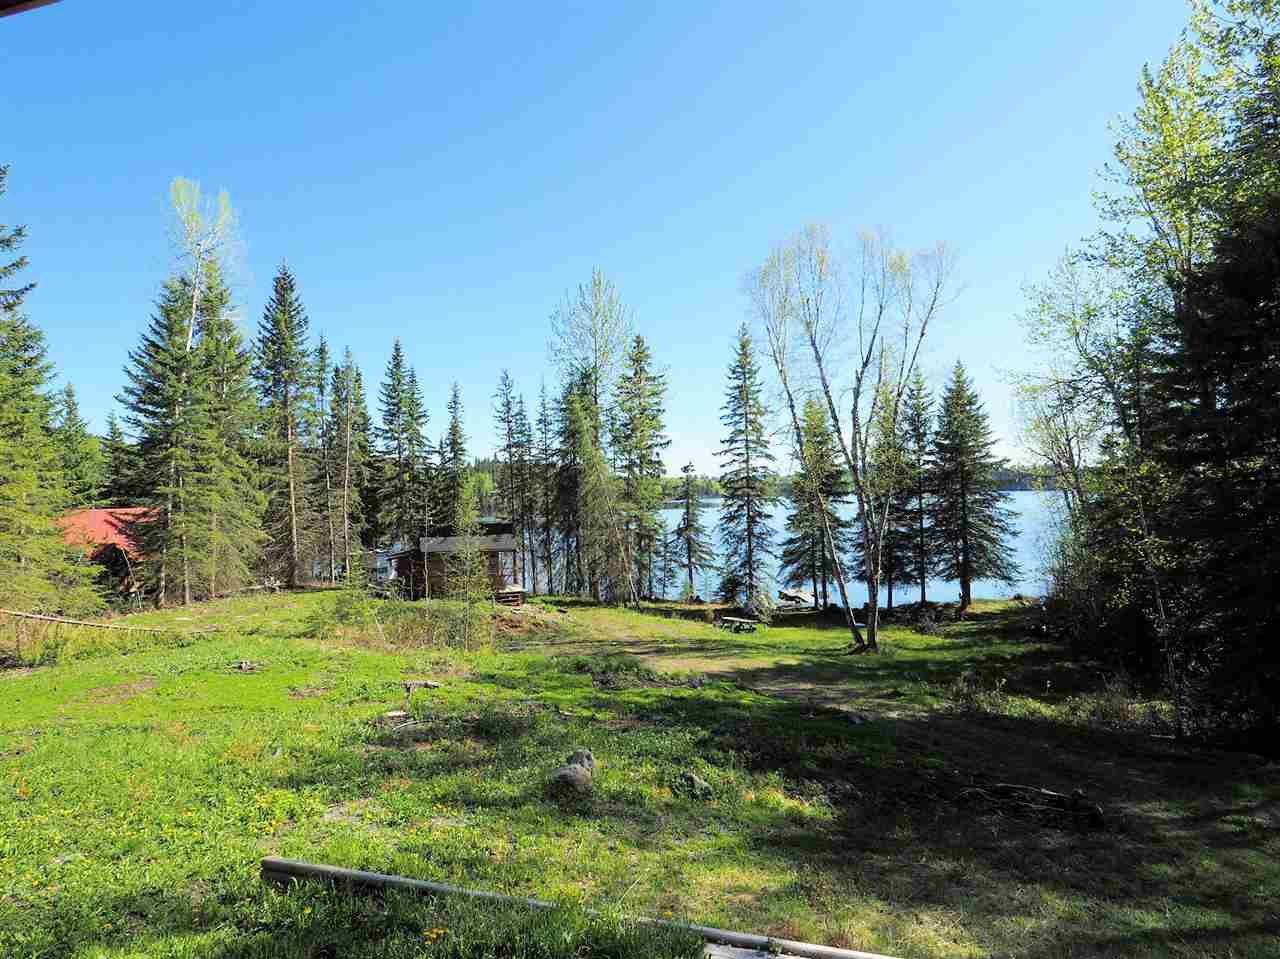 Photo 8: Photos: 8222 CENTENNIAL Road in Bridge Lake: Bridge Lake/Sheridan Lake House for sale (100 Mile House (Zone 10))  : MLS®# R2457362